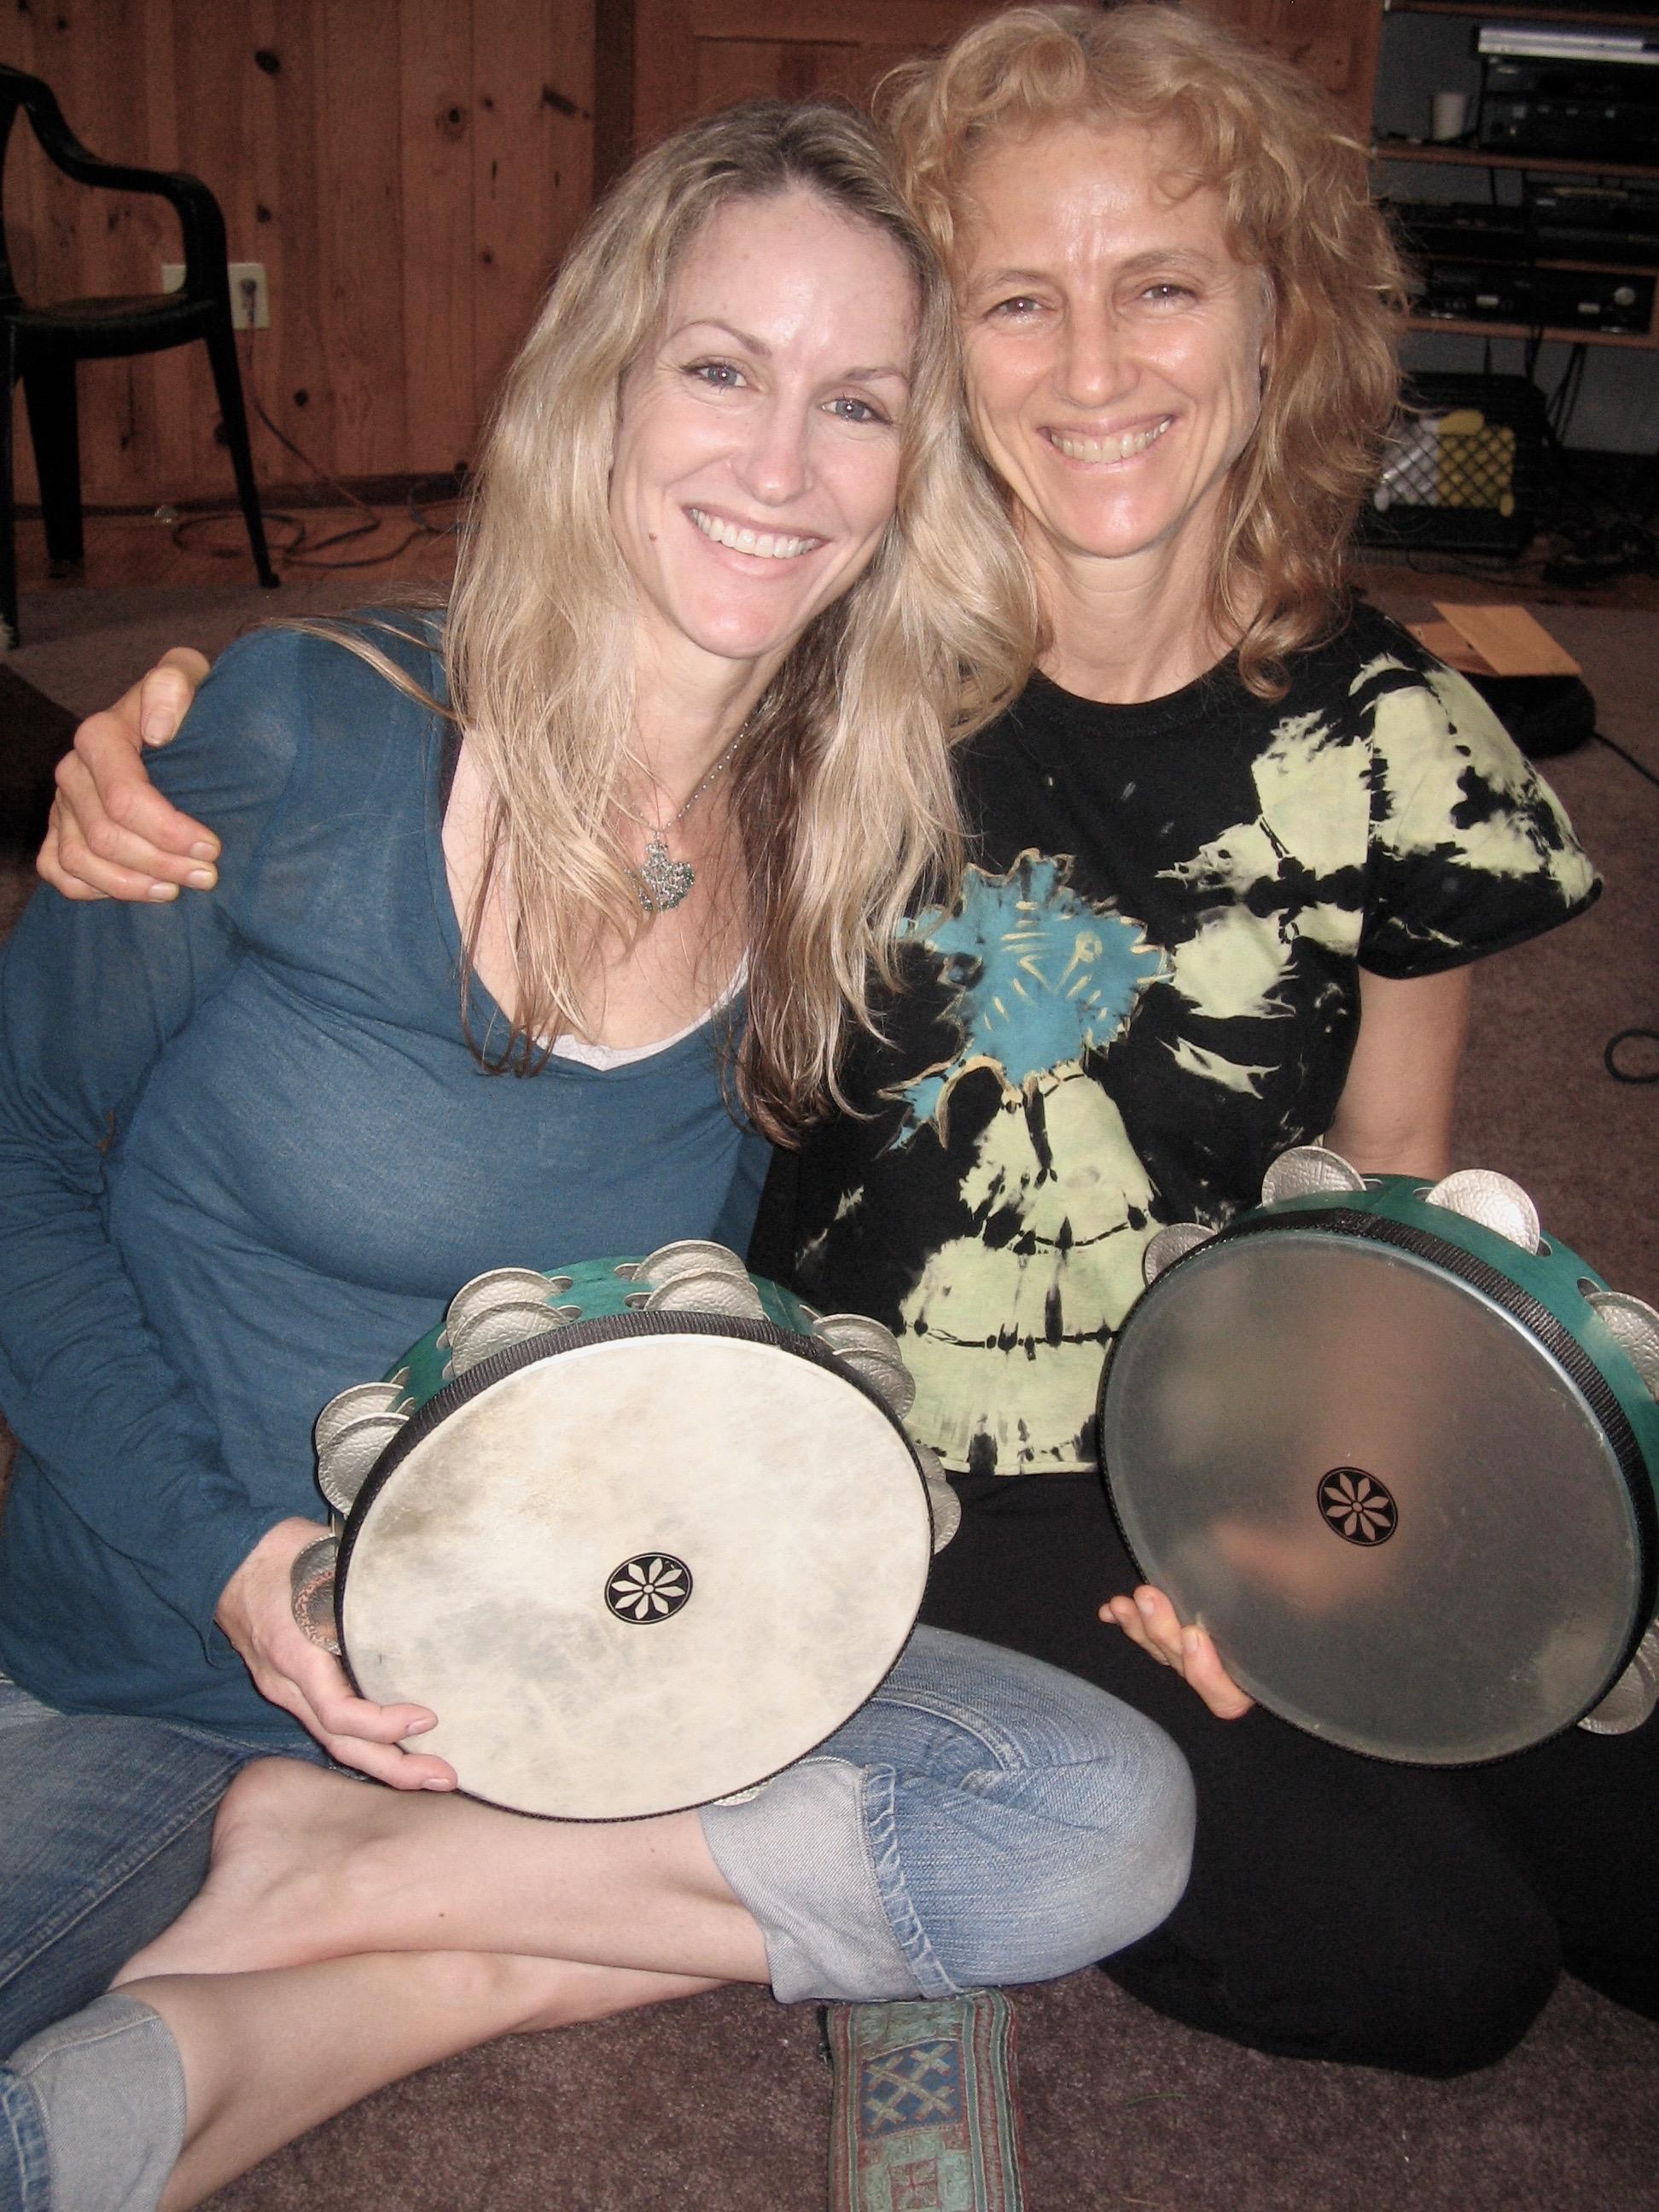 Krista Holland and Layne Redmond